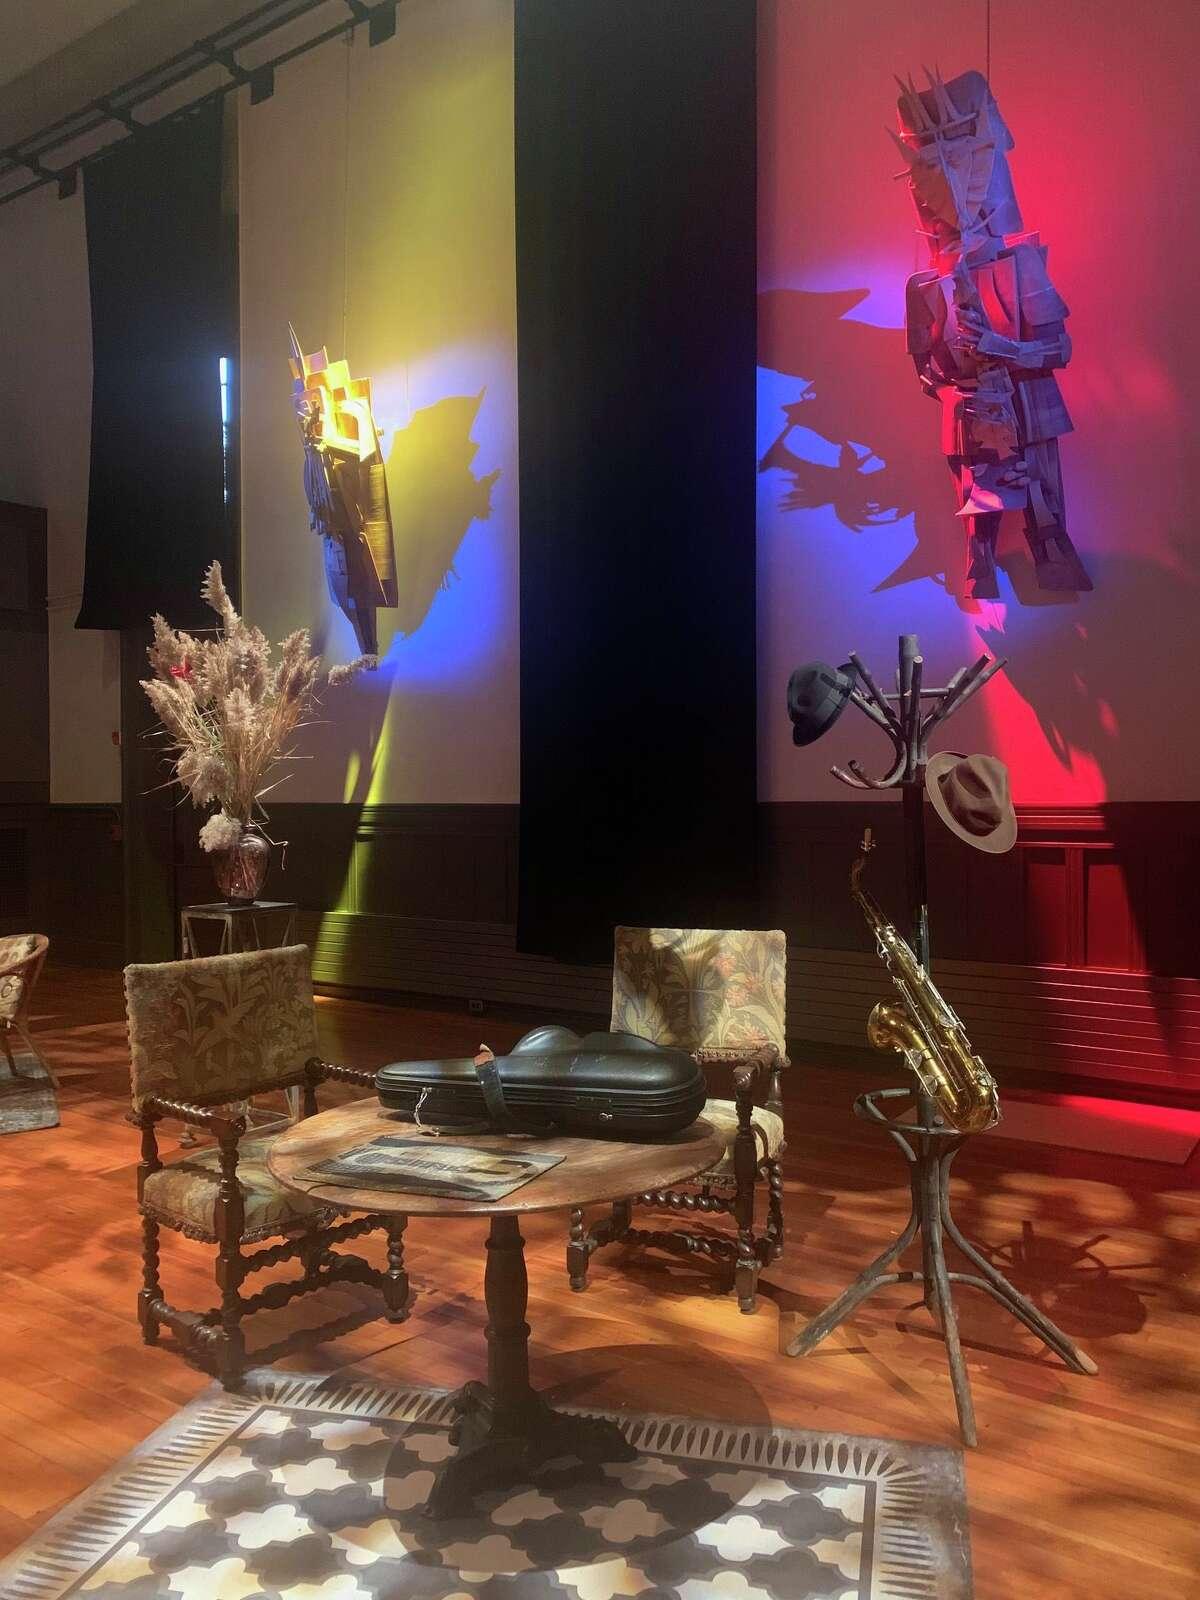 Hanging - Sun Ra sculptures by Reginald Madison at Hudson Hall.